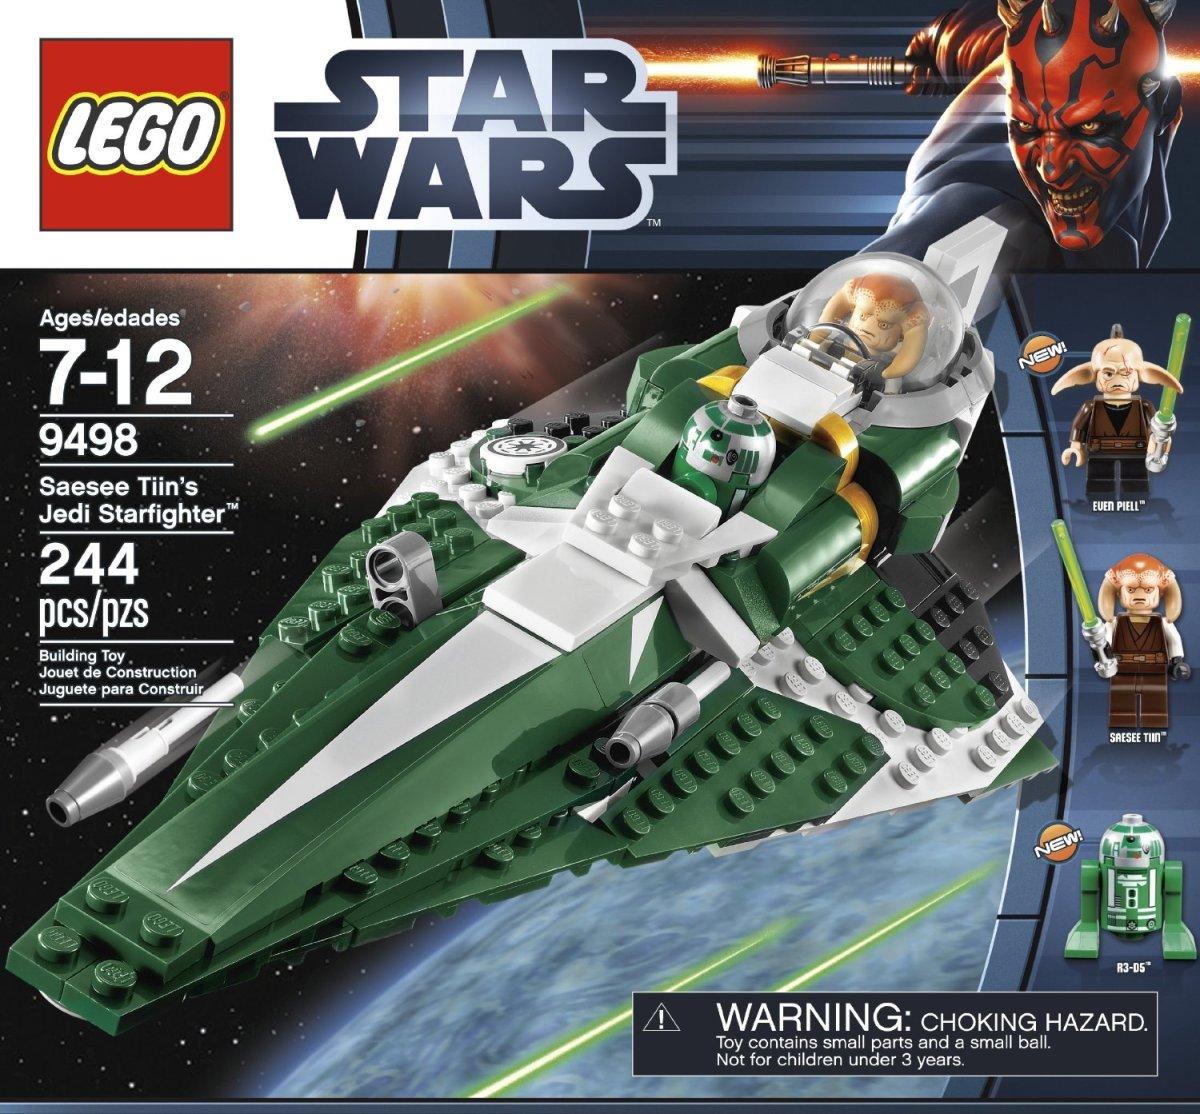 LEGO Star Wars Saesee Tiin's Jedi Starfighter 9498 Box